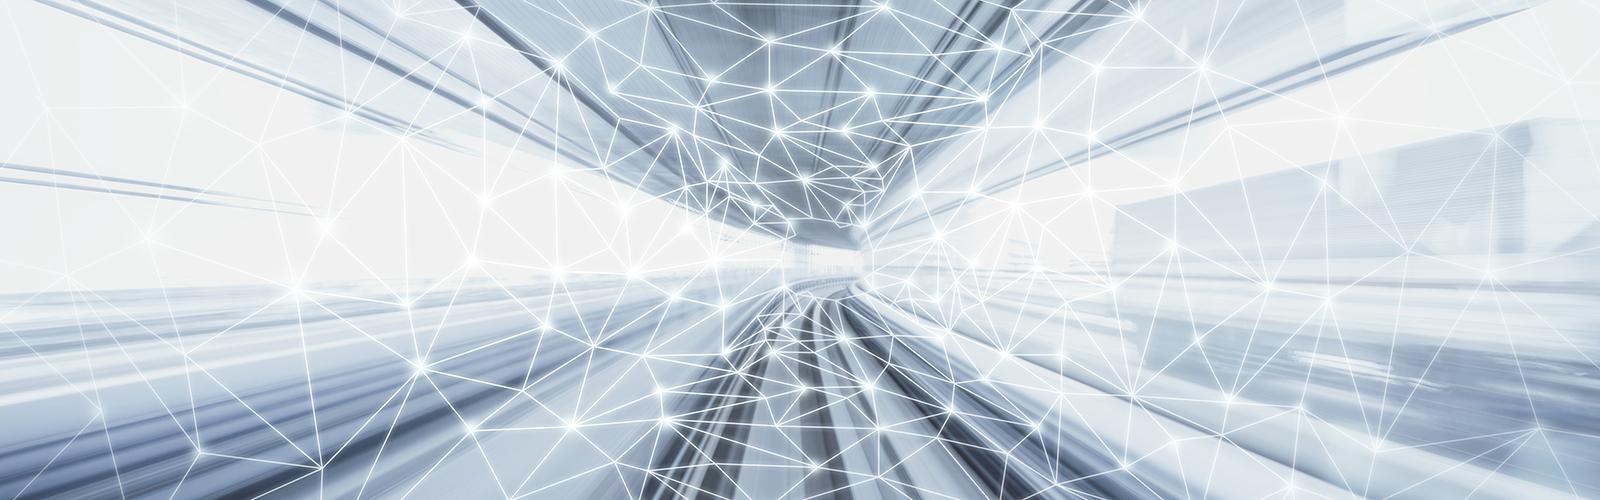 Intelligent Infrastructure: Delivering Asset Efficiencies for the UK's High Speed Network